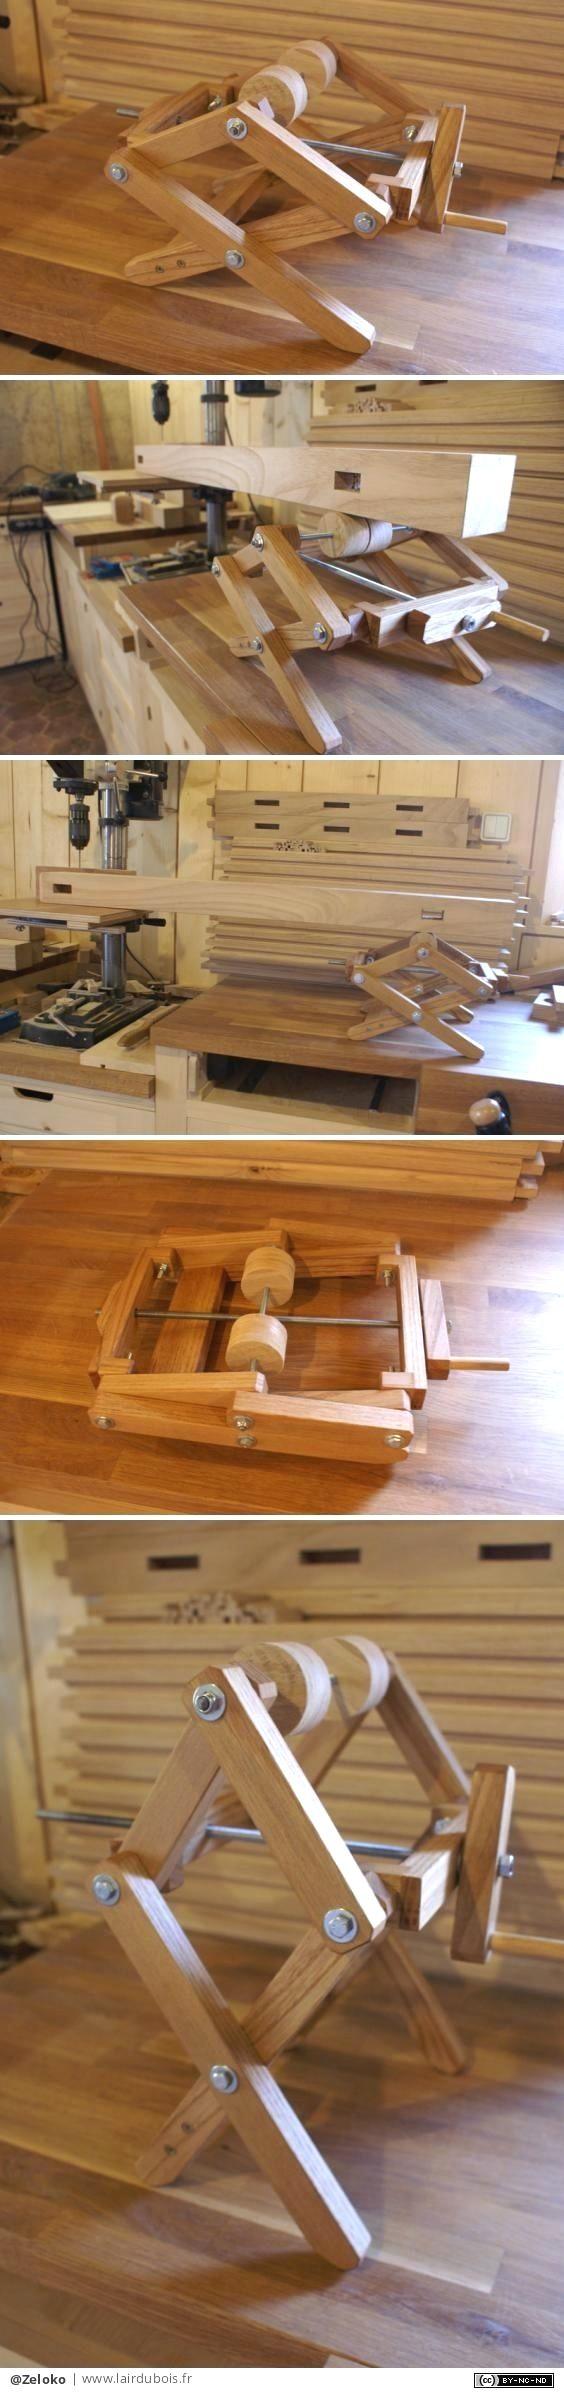 cool woodshop project ideas #woodworkplans